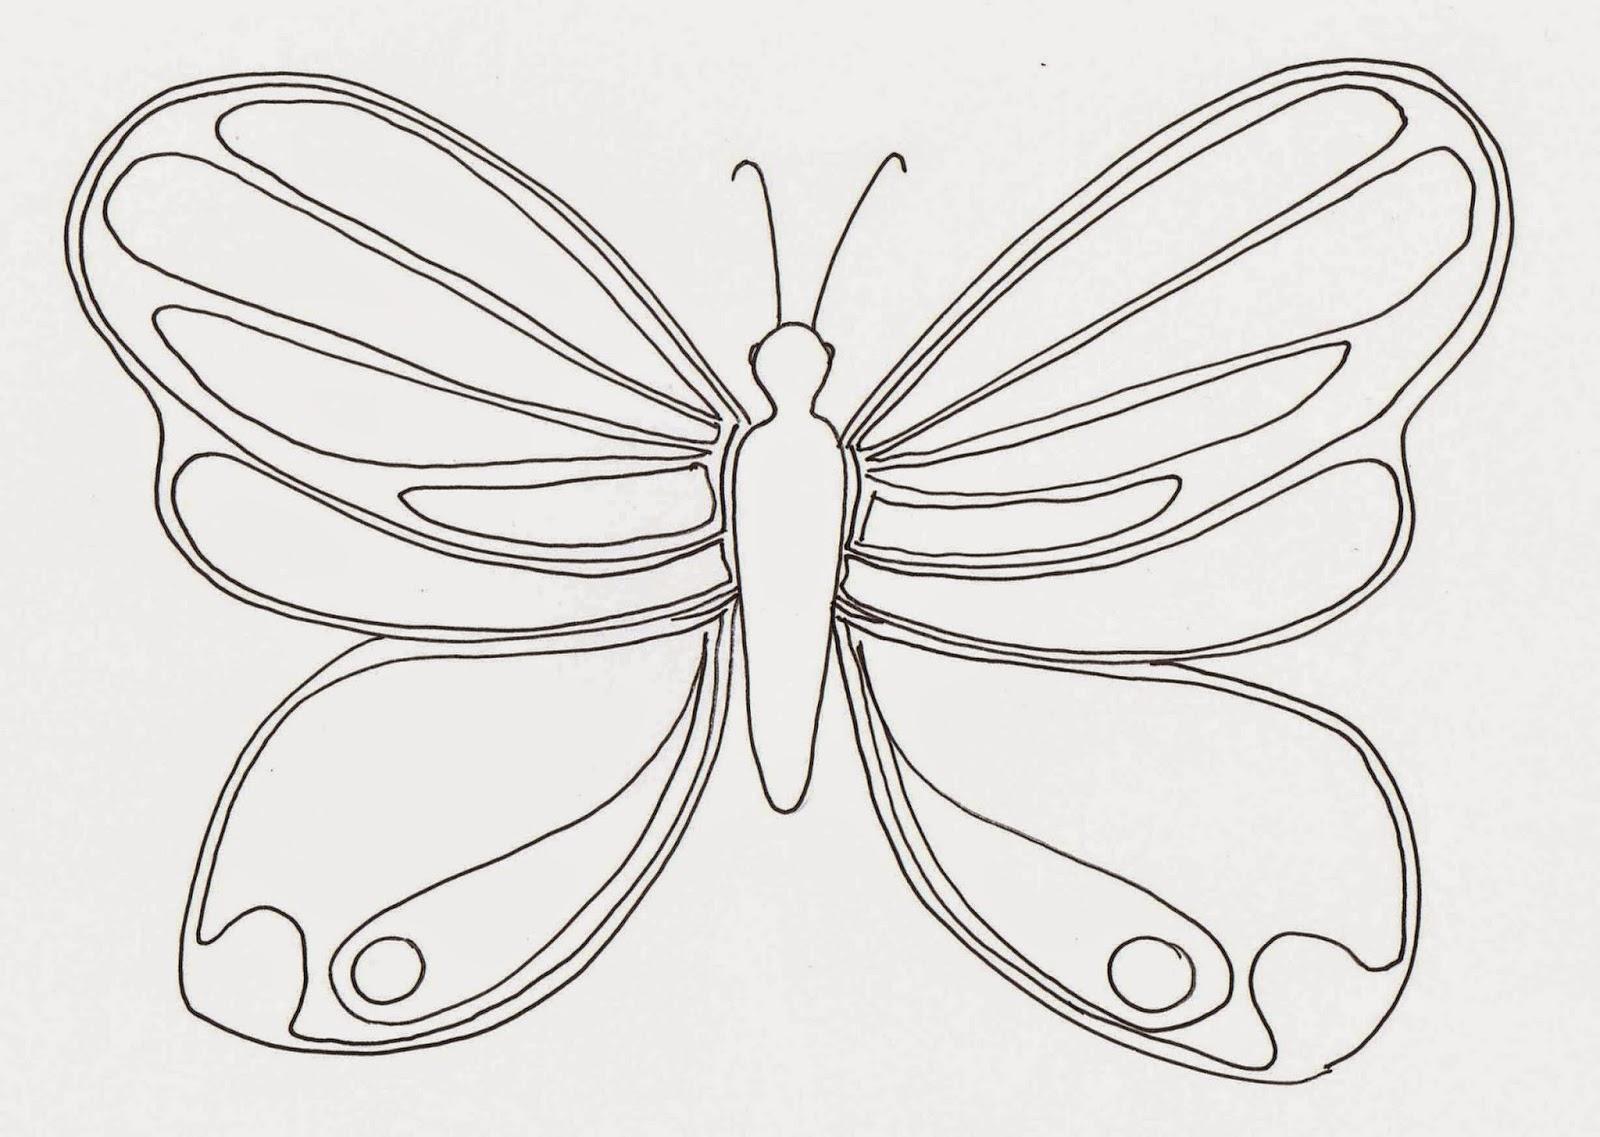 Lujo Mariposa Detallada Para Colorear Motivo - Dibujos Para Colorear ...